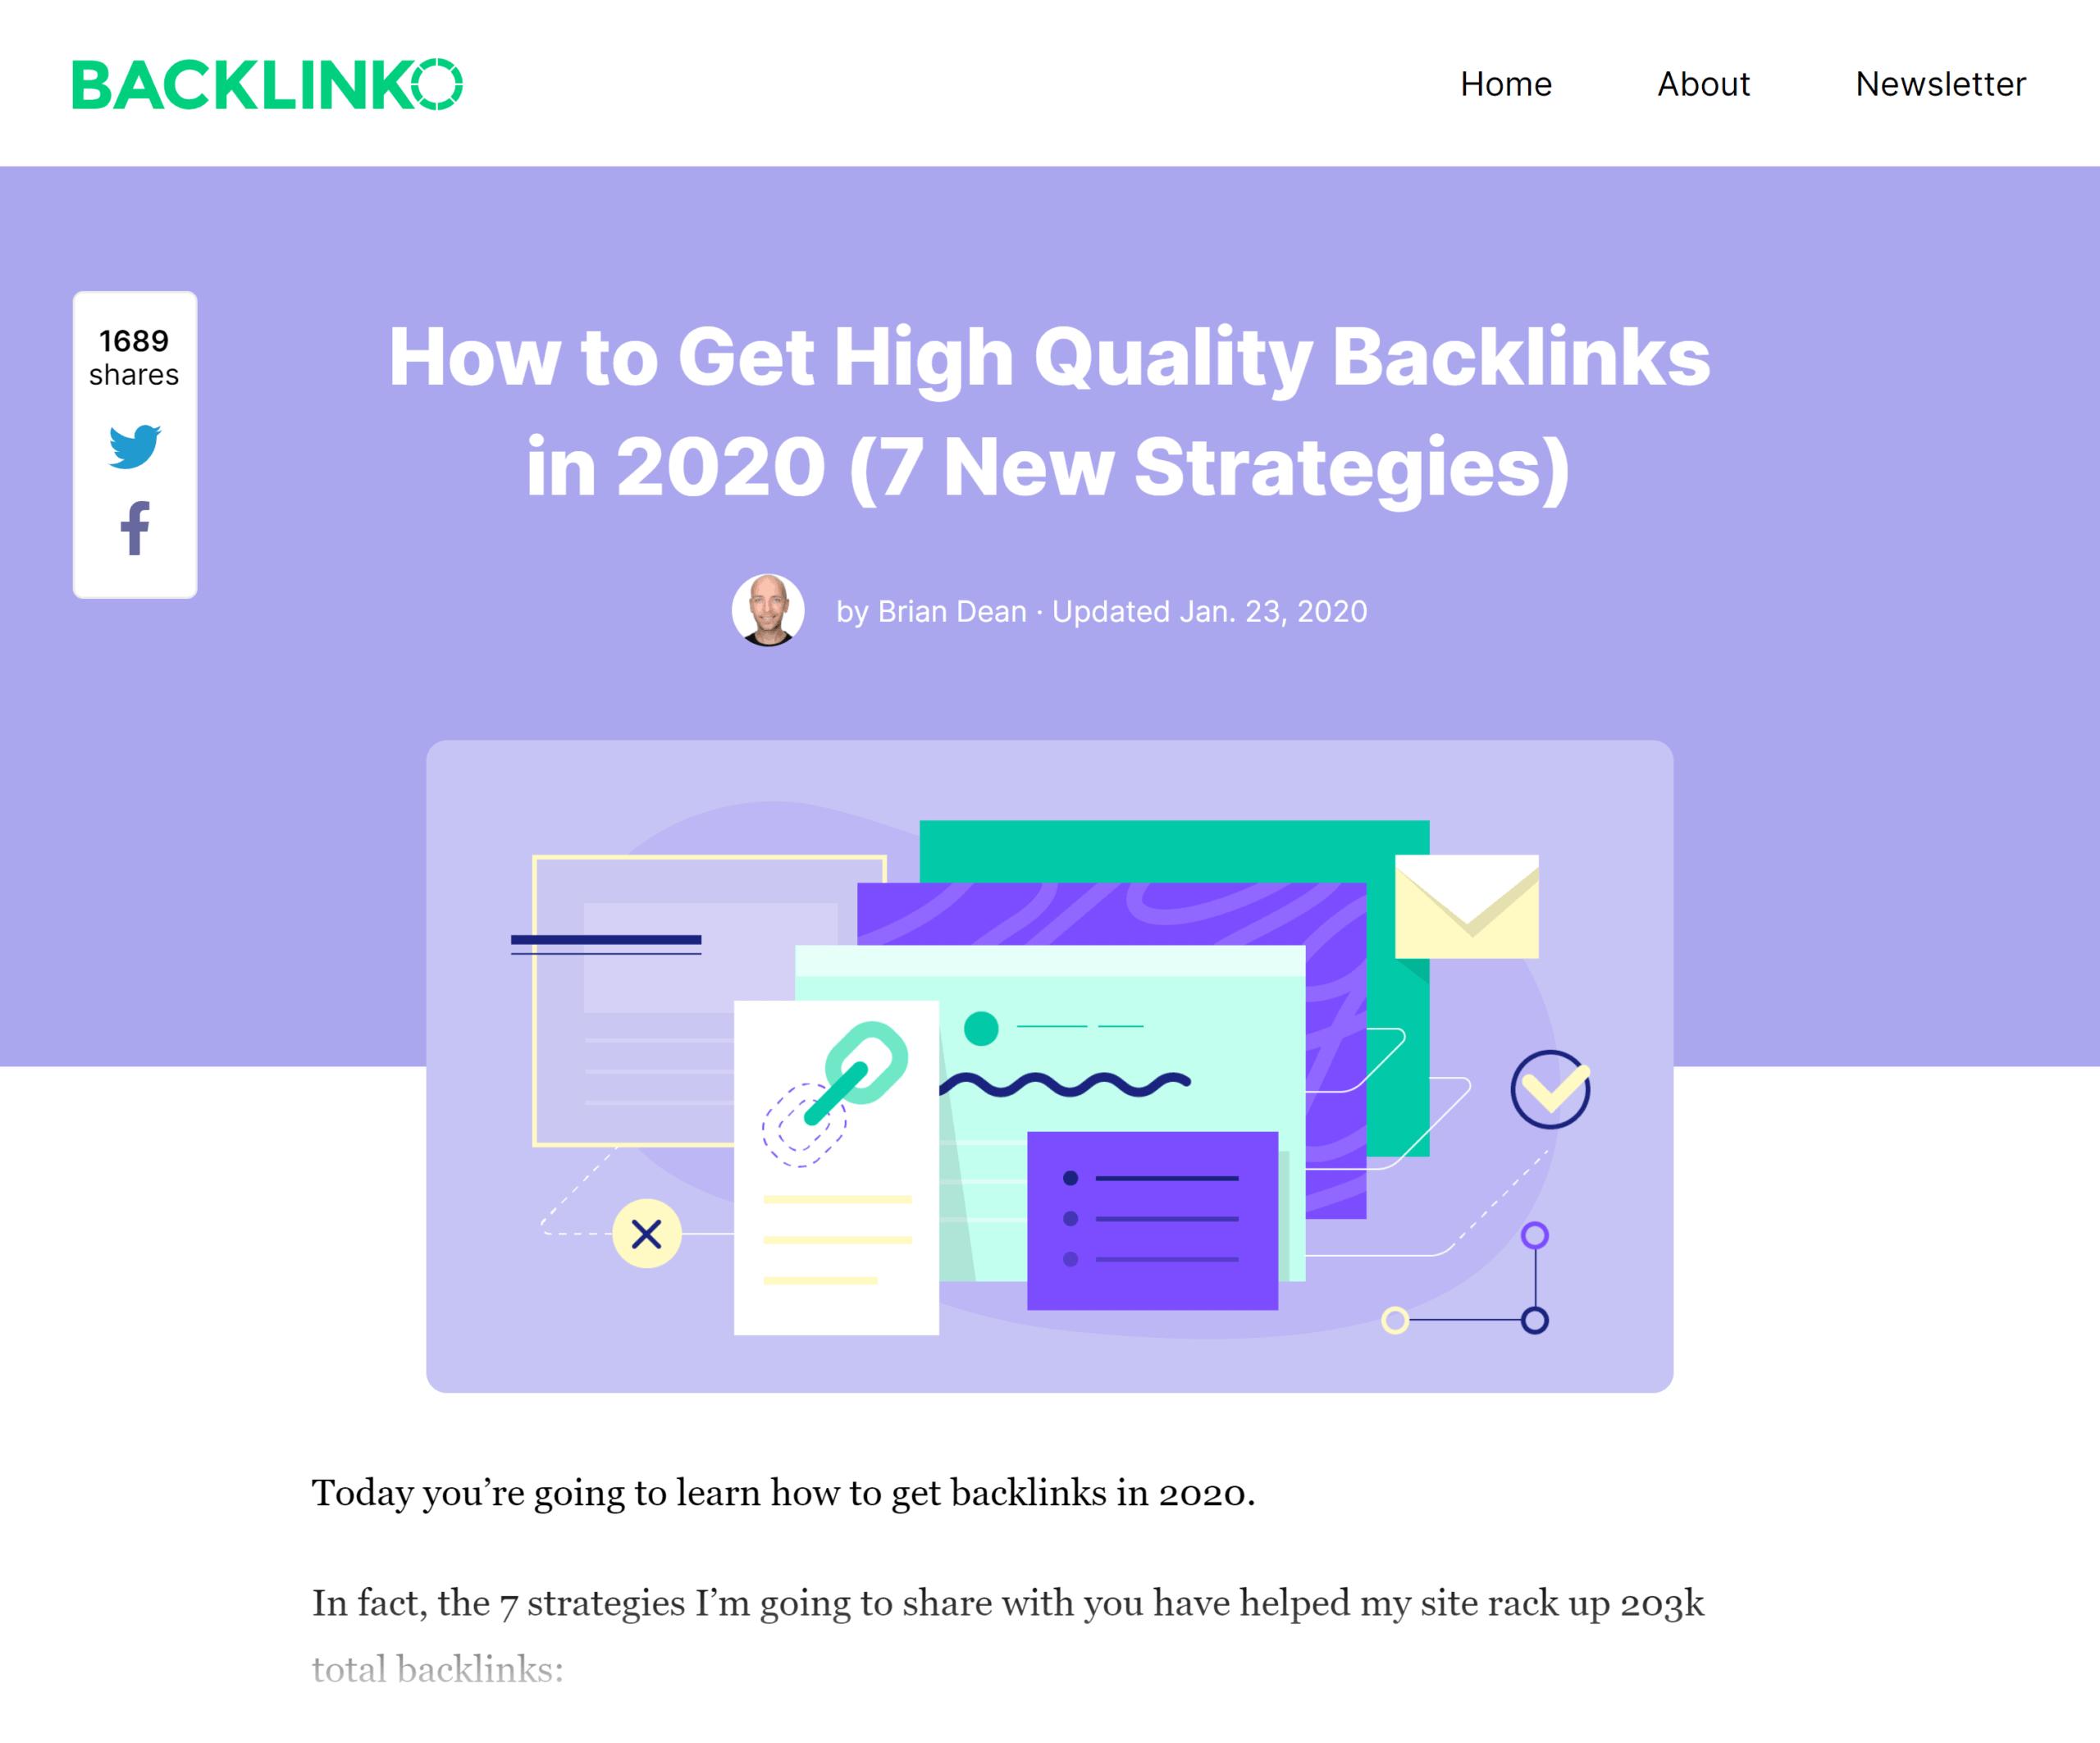 Backlinko – High Quality Backlinks post